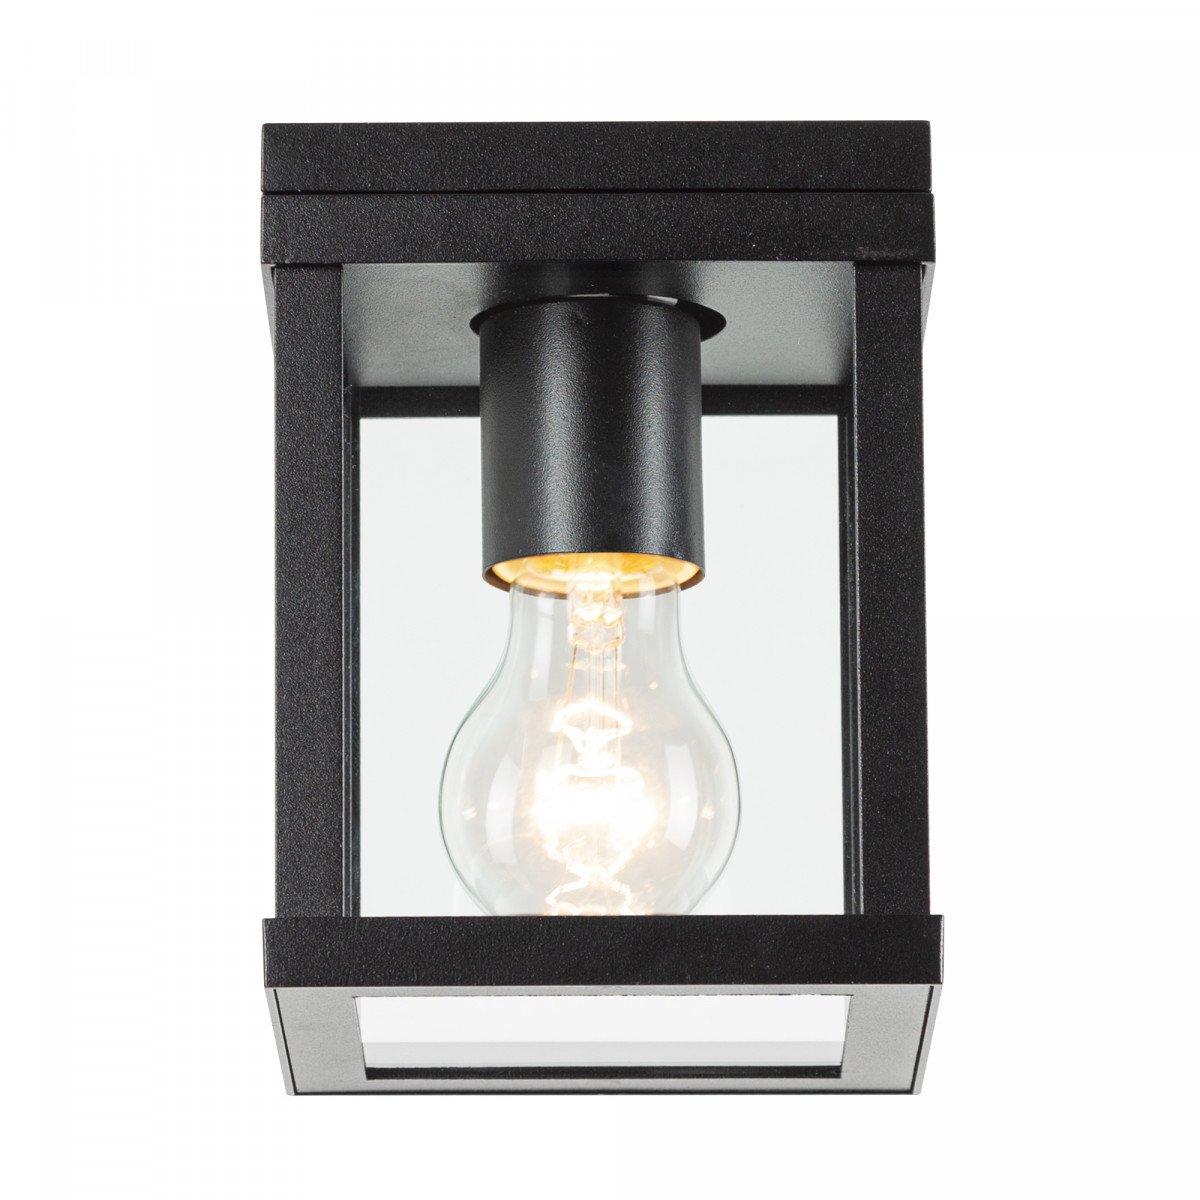 Buiten plafond lamp zwart frame met heldere glazen industrieel karakter stijlvol zwarte plafondverlichting KS plafondlamp Jersey